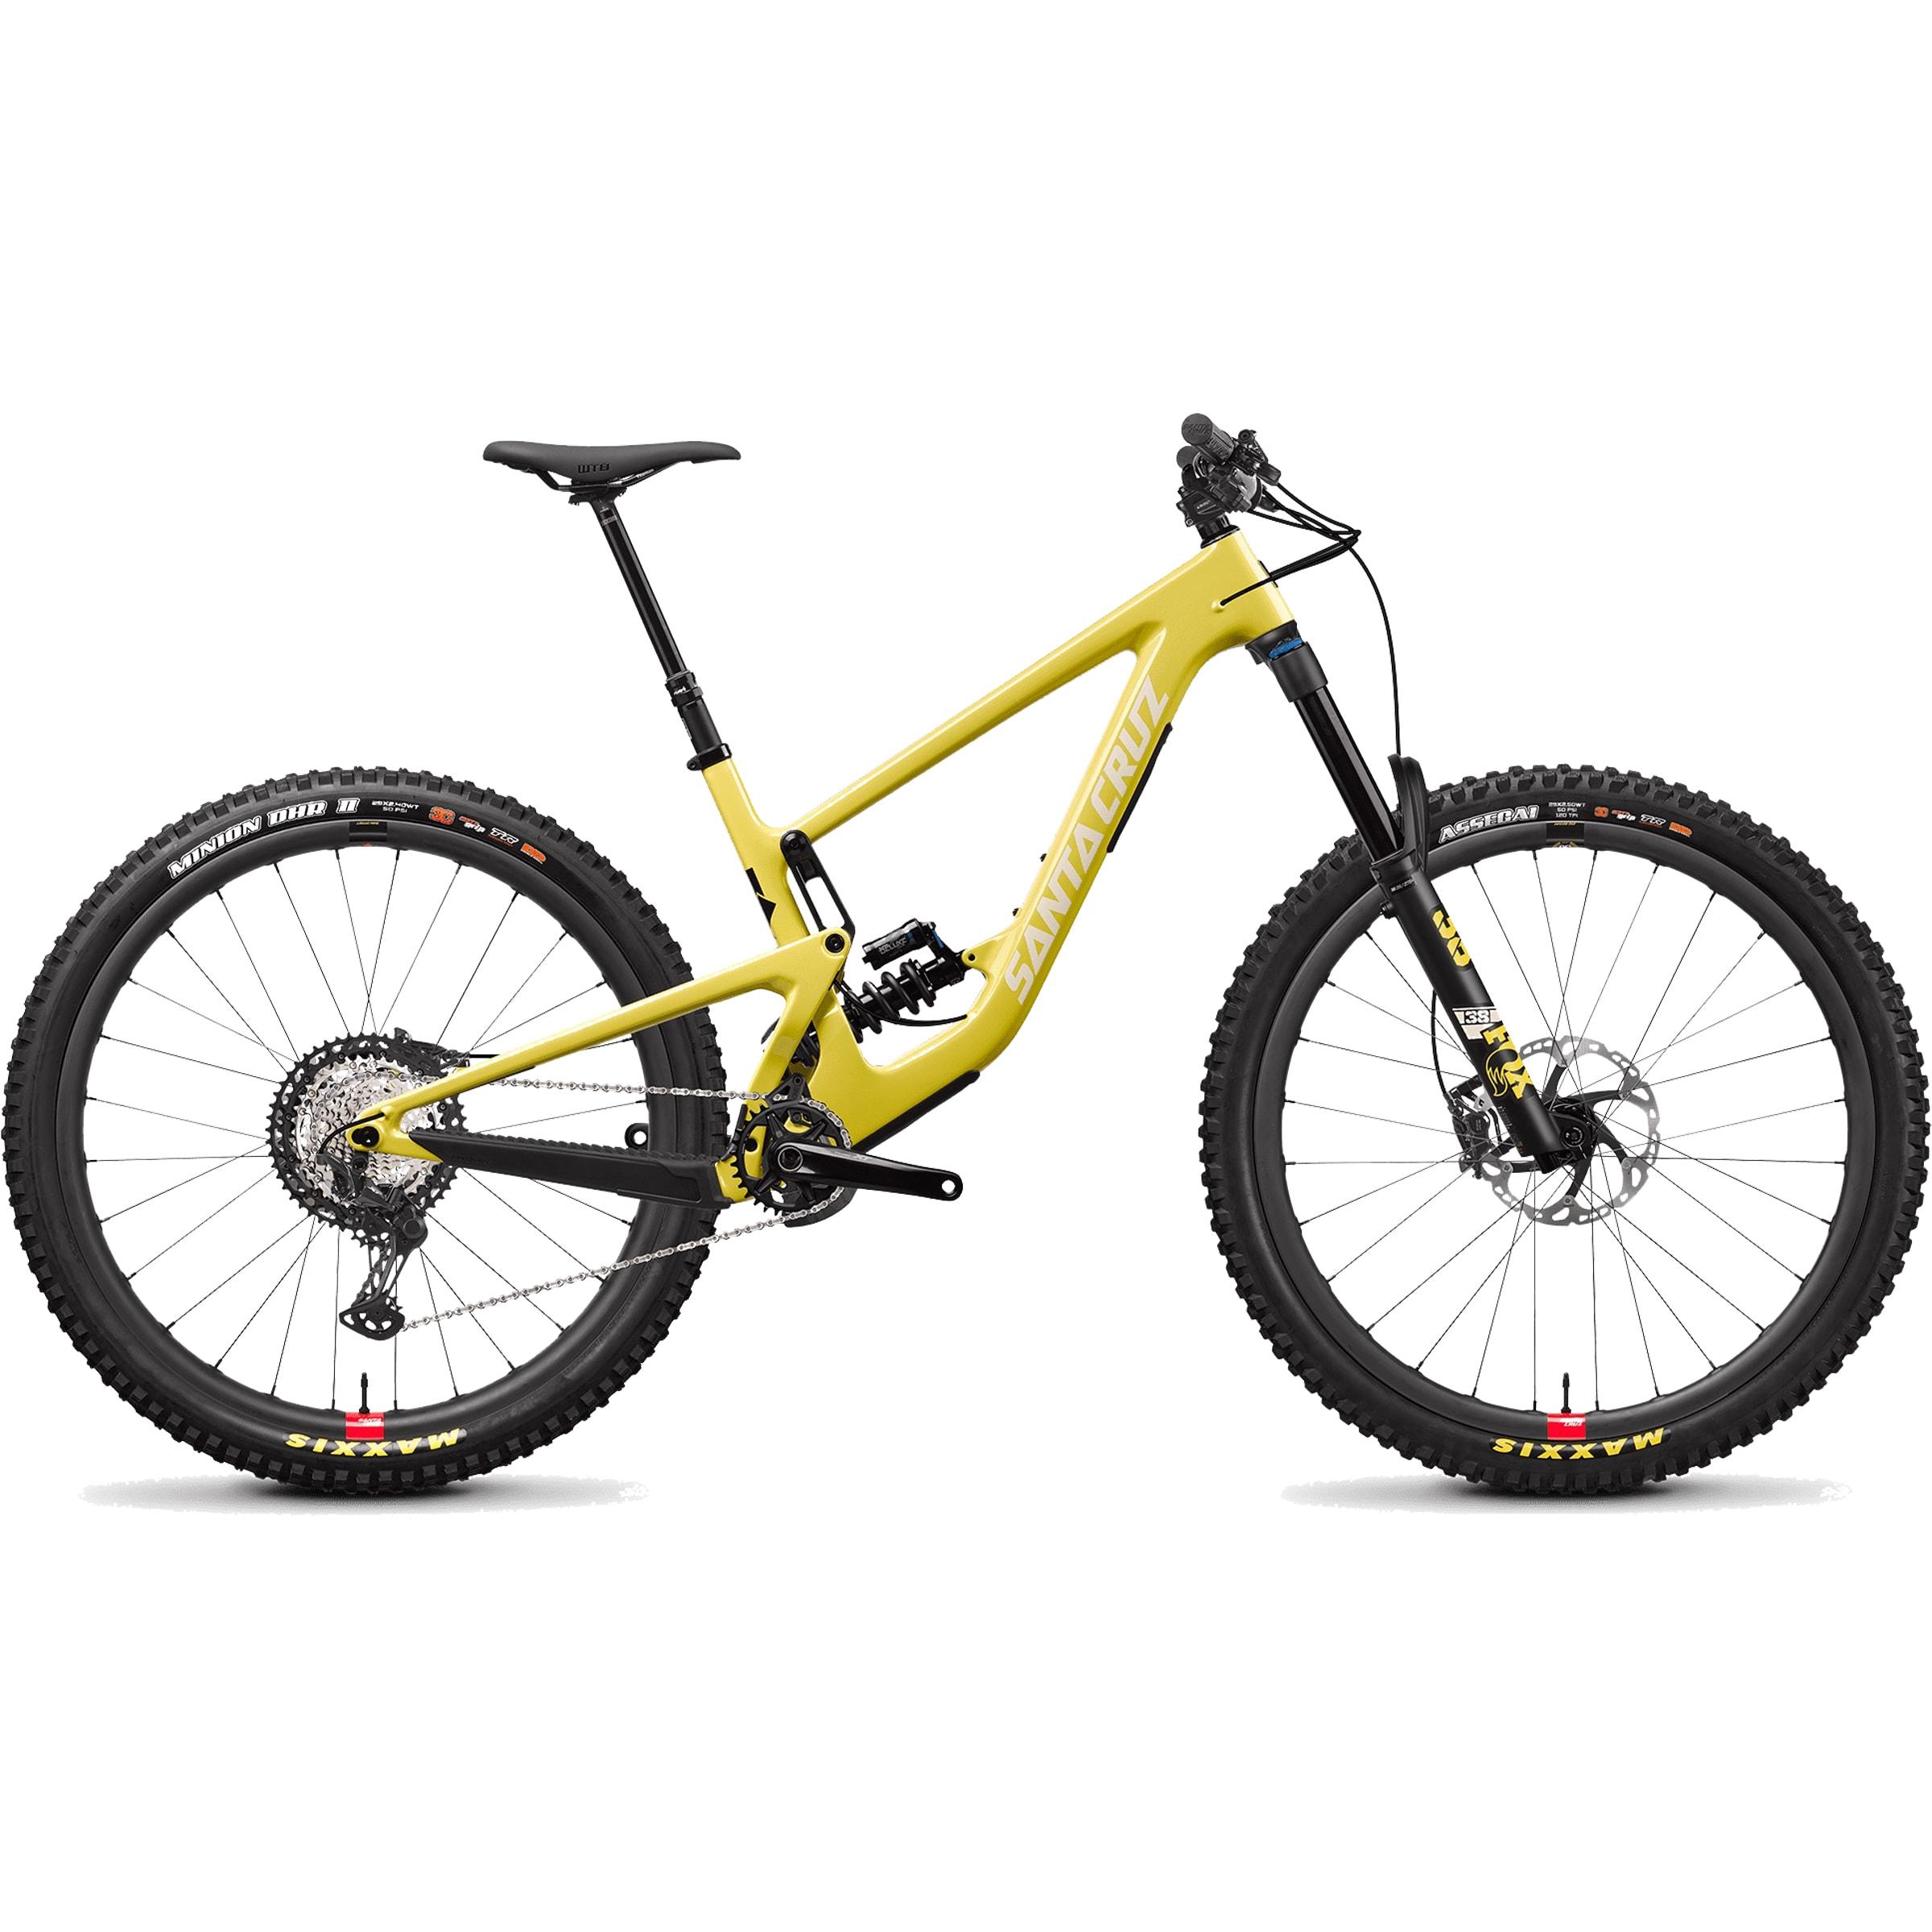 Image of Santa cruz Megatower C XT Coil Reserve 29er Mountain Bike 2022 Yellow